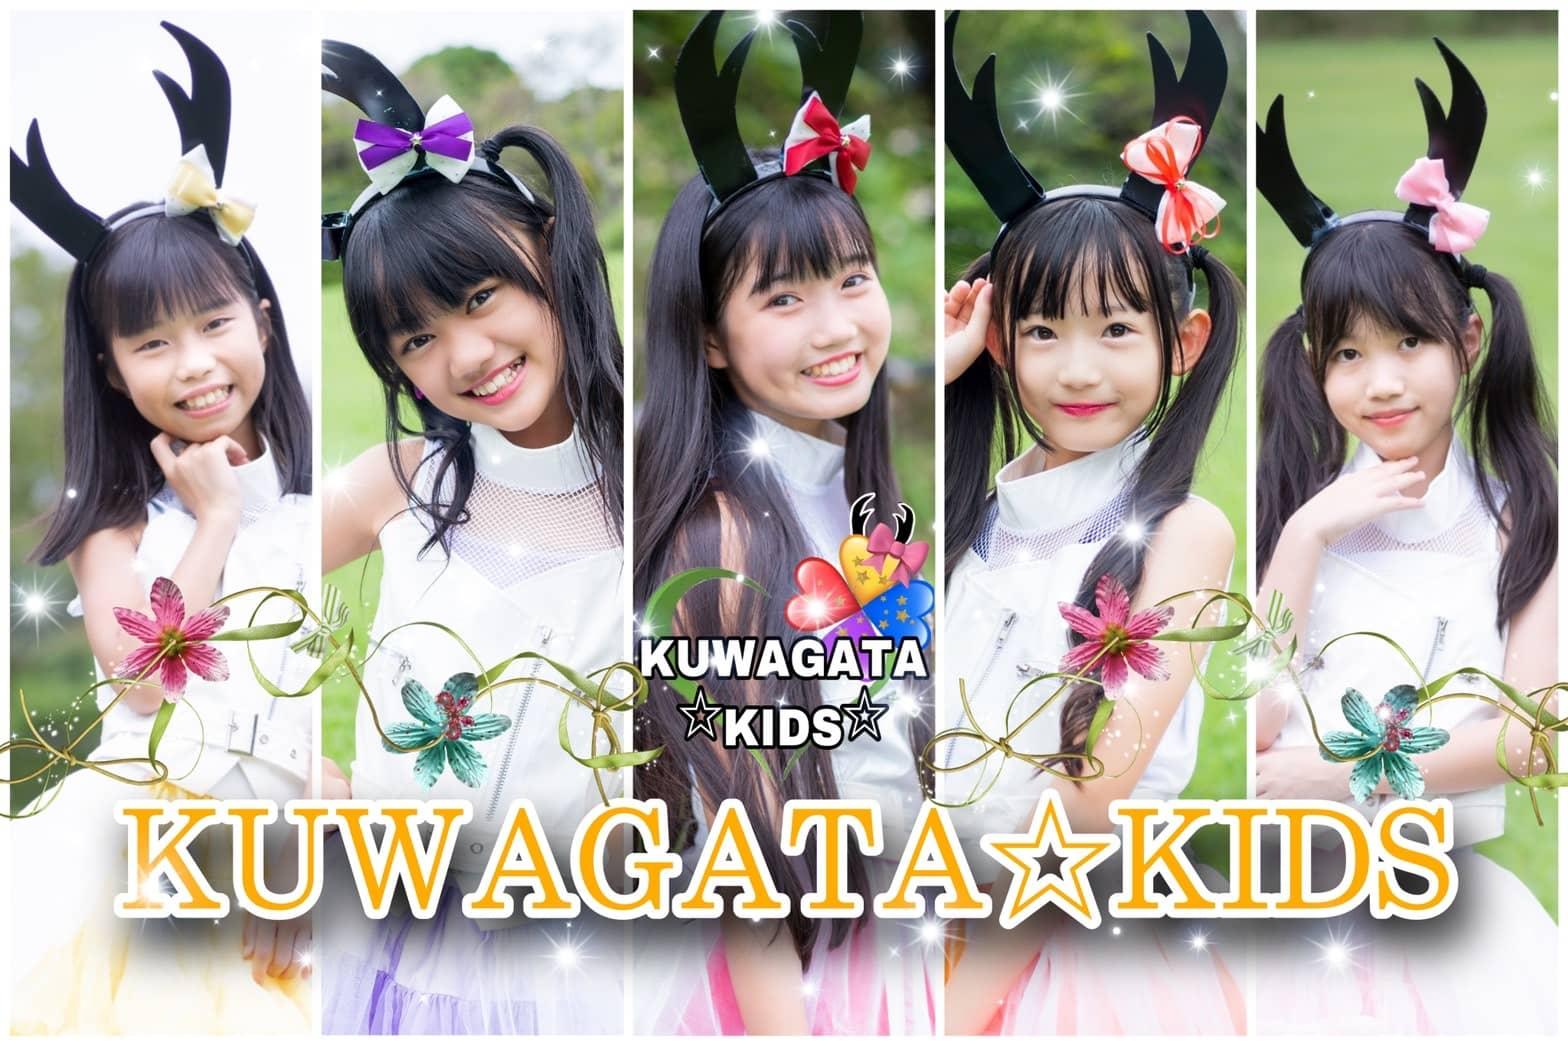 kuwagata-kids-topimg